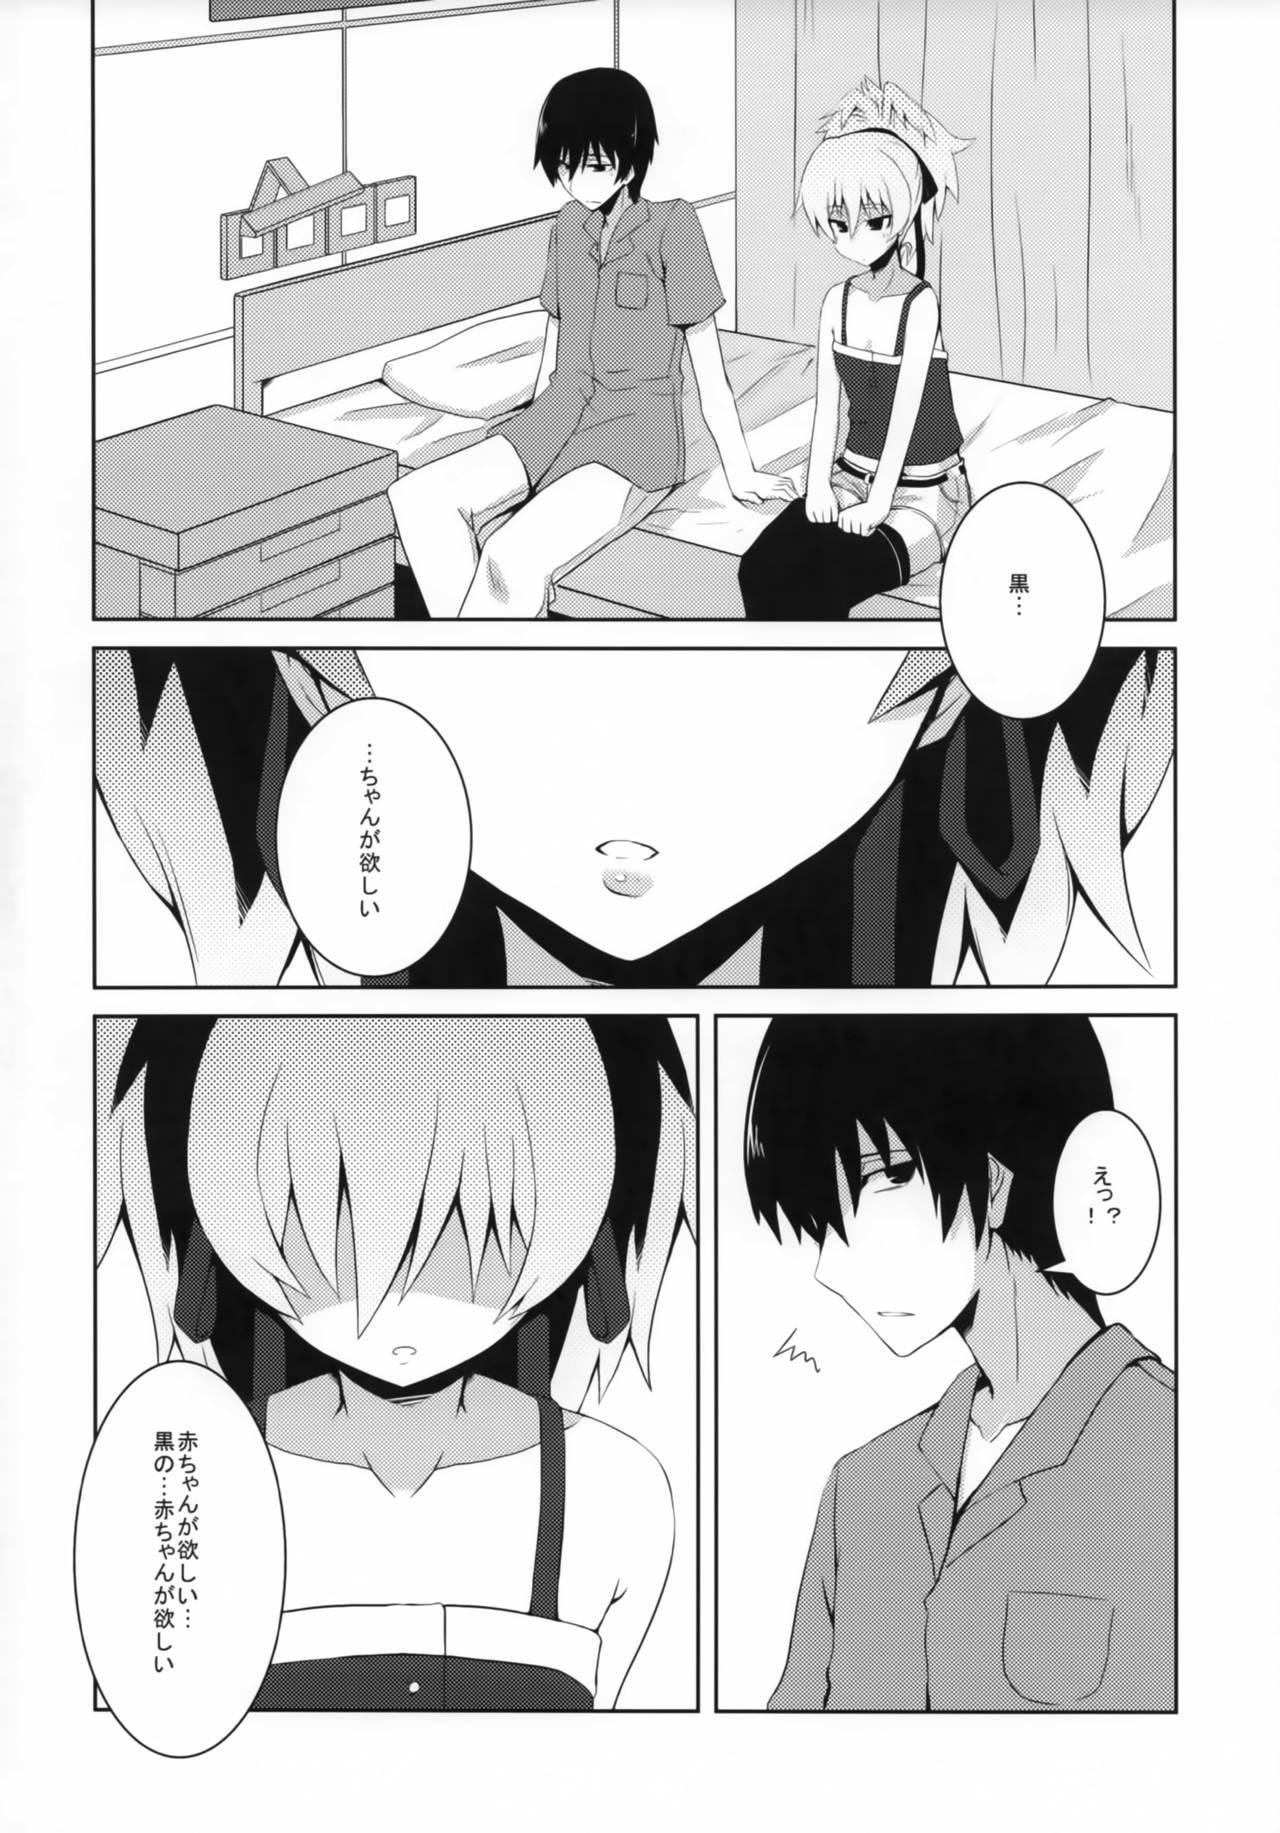 (COMIC1☆5) [Catcher's mitt of silver (Kaname Nagi)] ~Giniro no Negai~ (DARKER THAN BLACK) 6